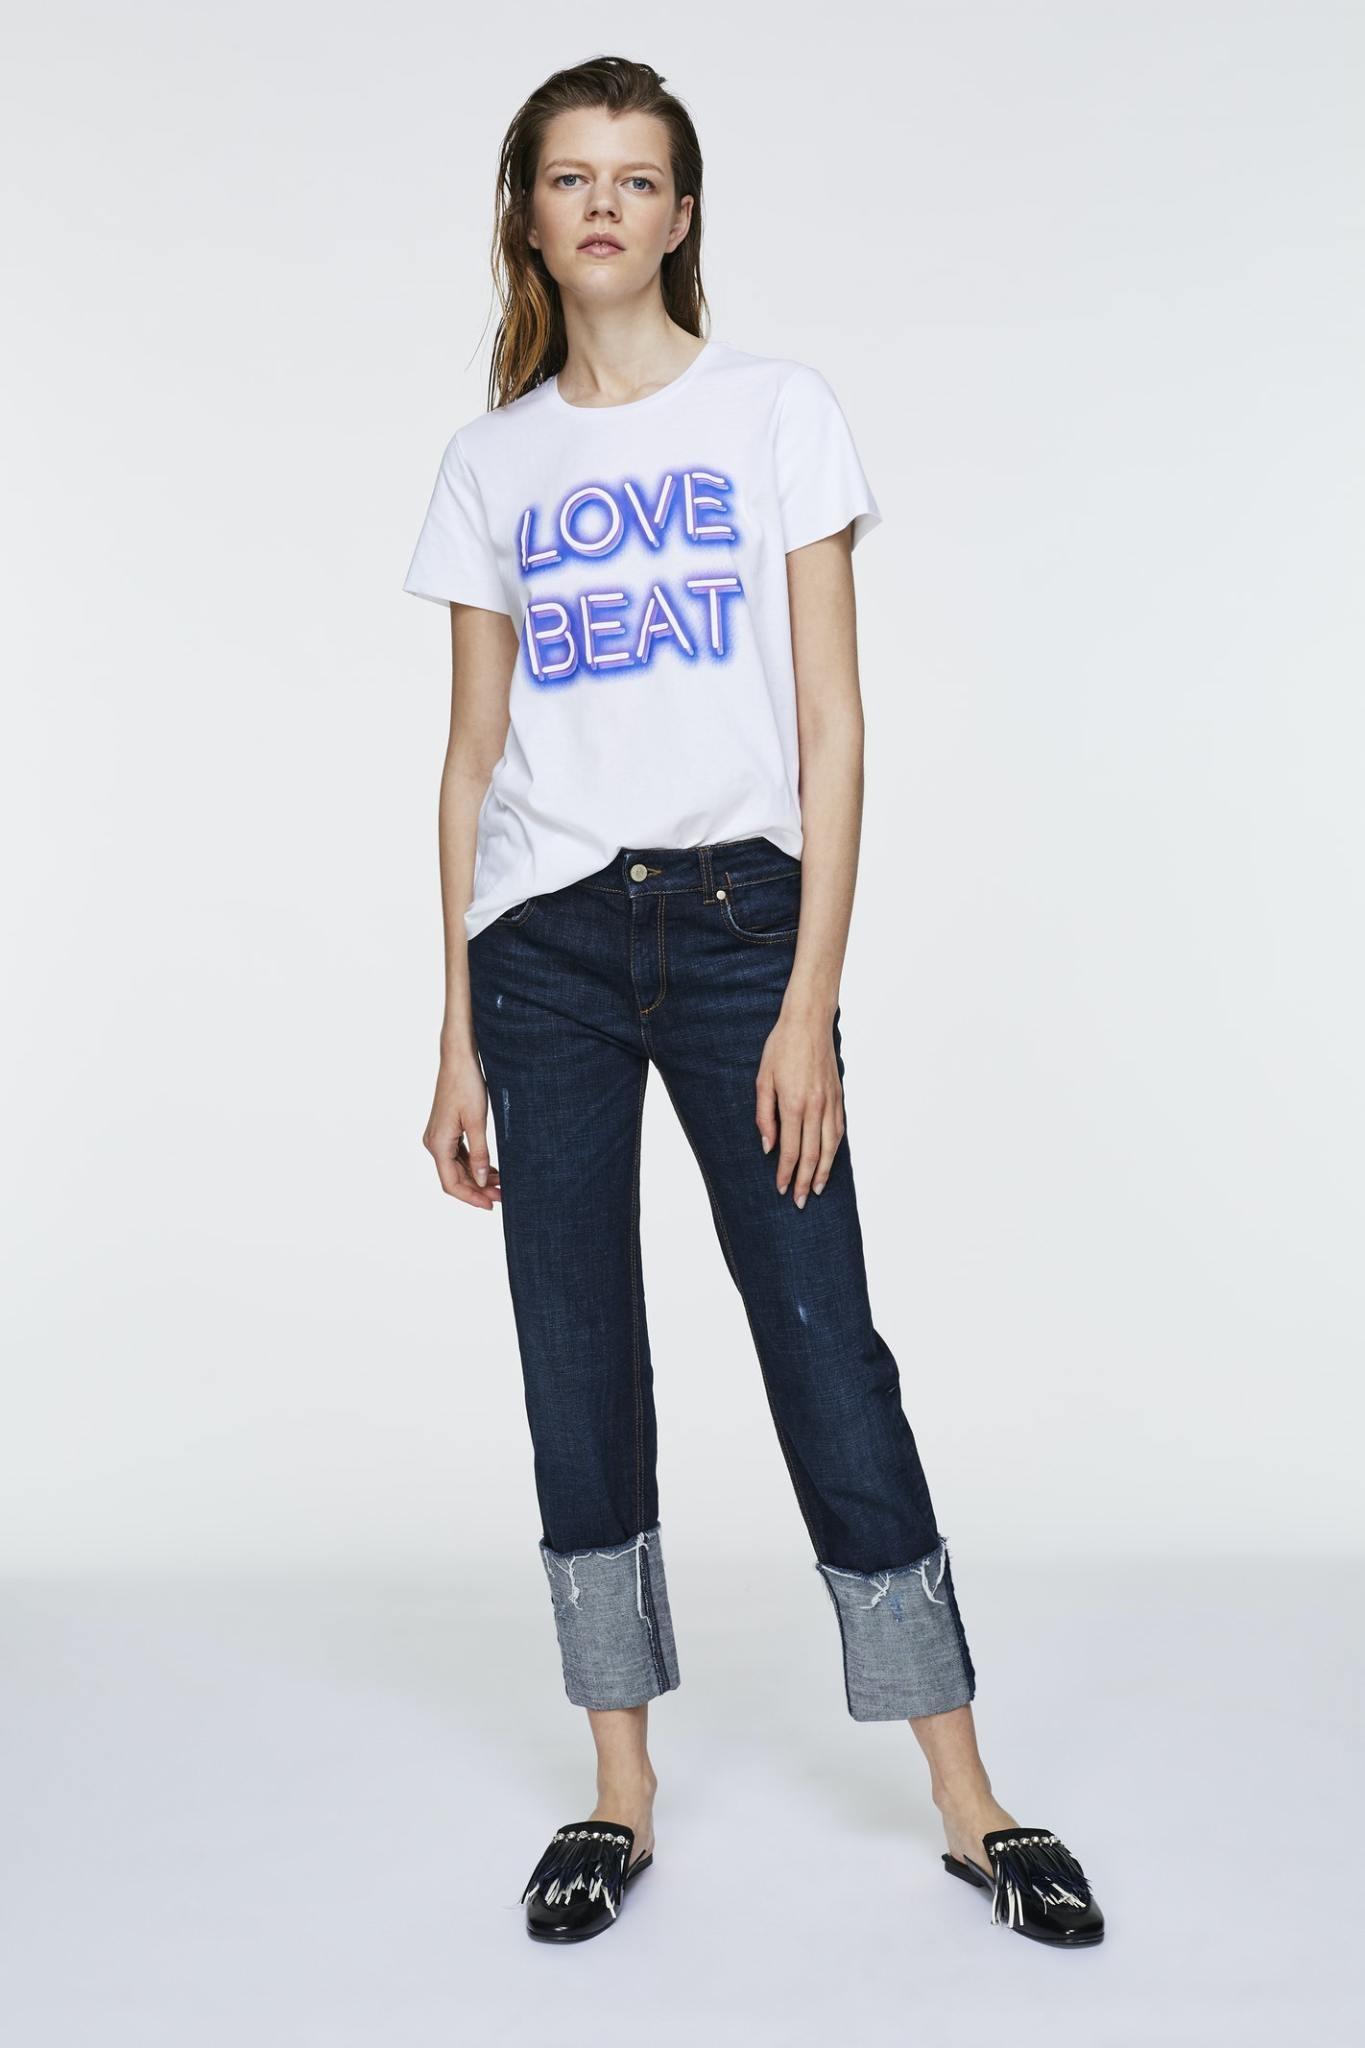 Neon love beat shirt dorothee schumacher-9